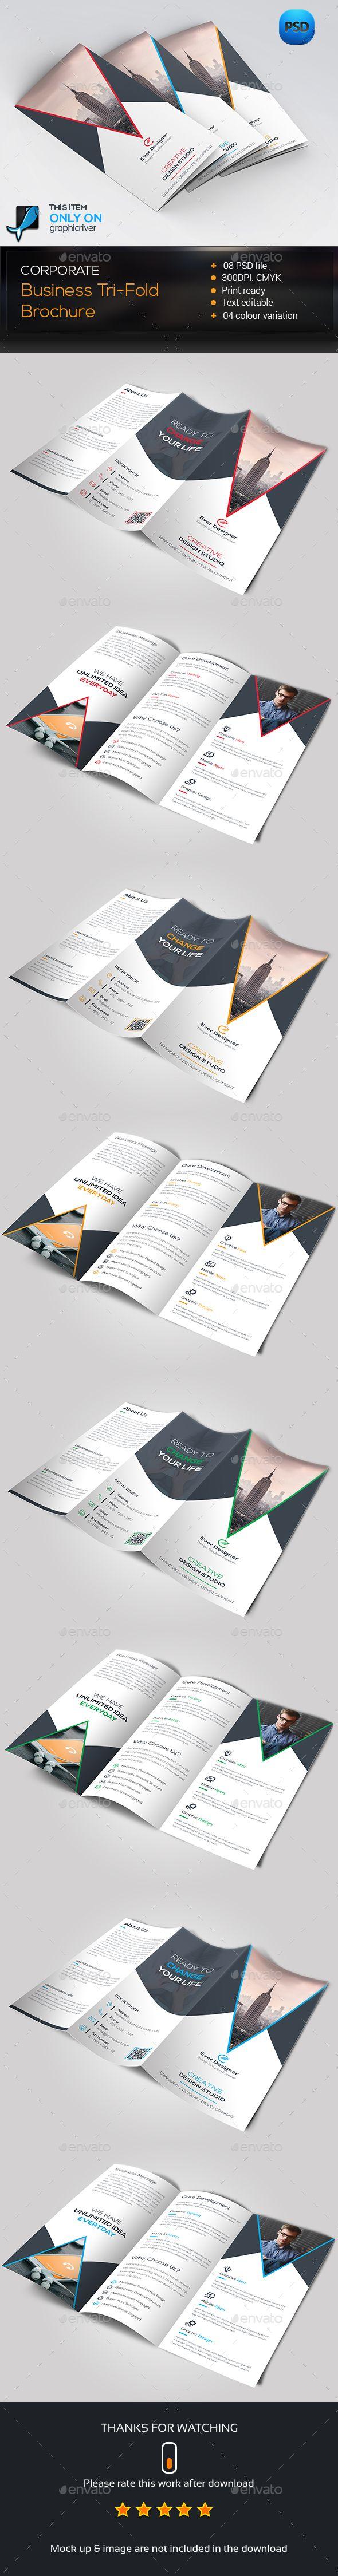 Corporate Trifold Brochure Template PSD #design Download: http://graphicriver.net/item/corporate-trifold-brochure/14272705?ref=ksioks